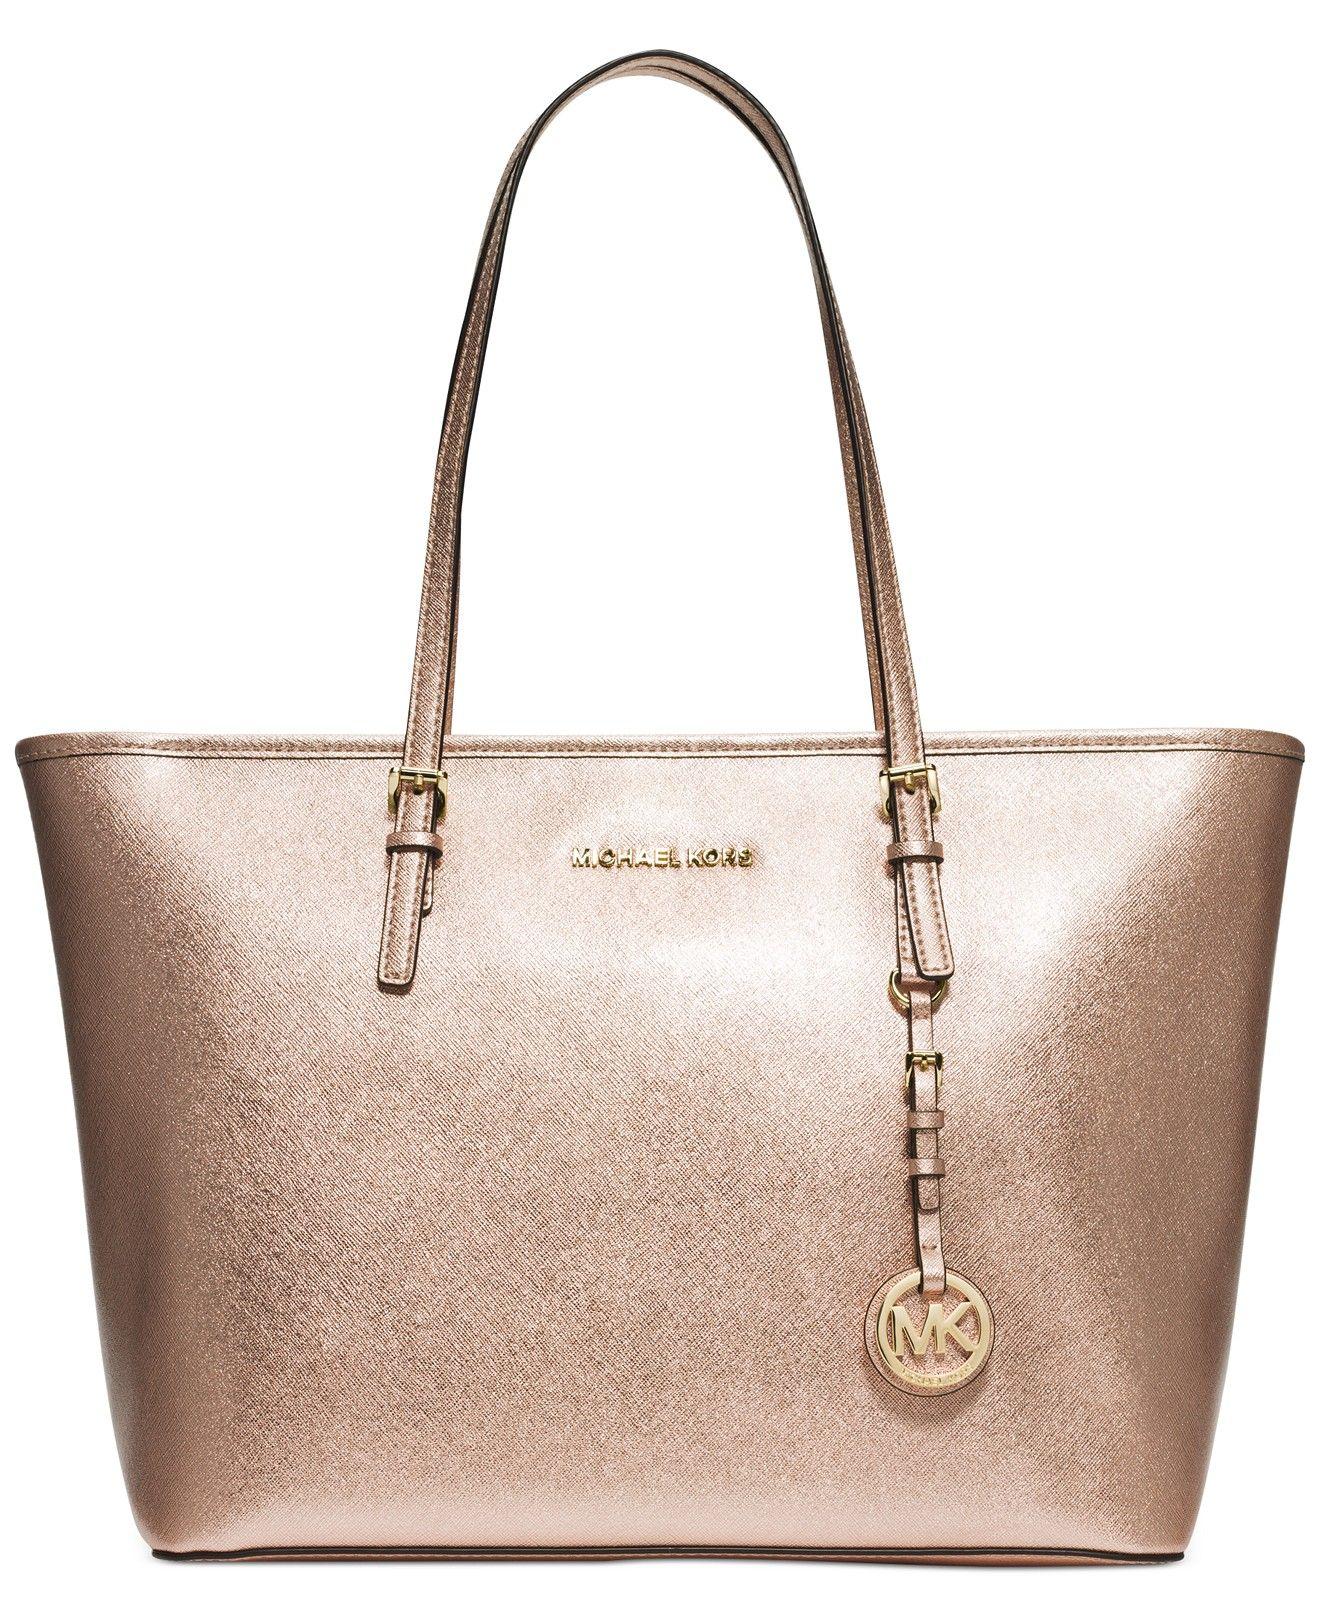 Michael Kors Jet Set Travel Top Zip Tote Clearance Handbags